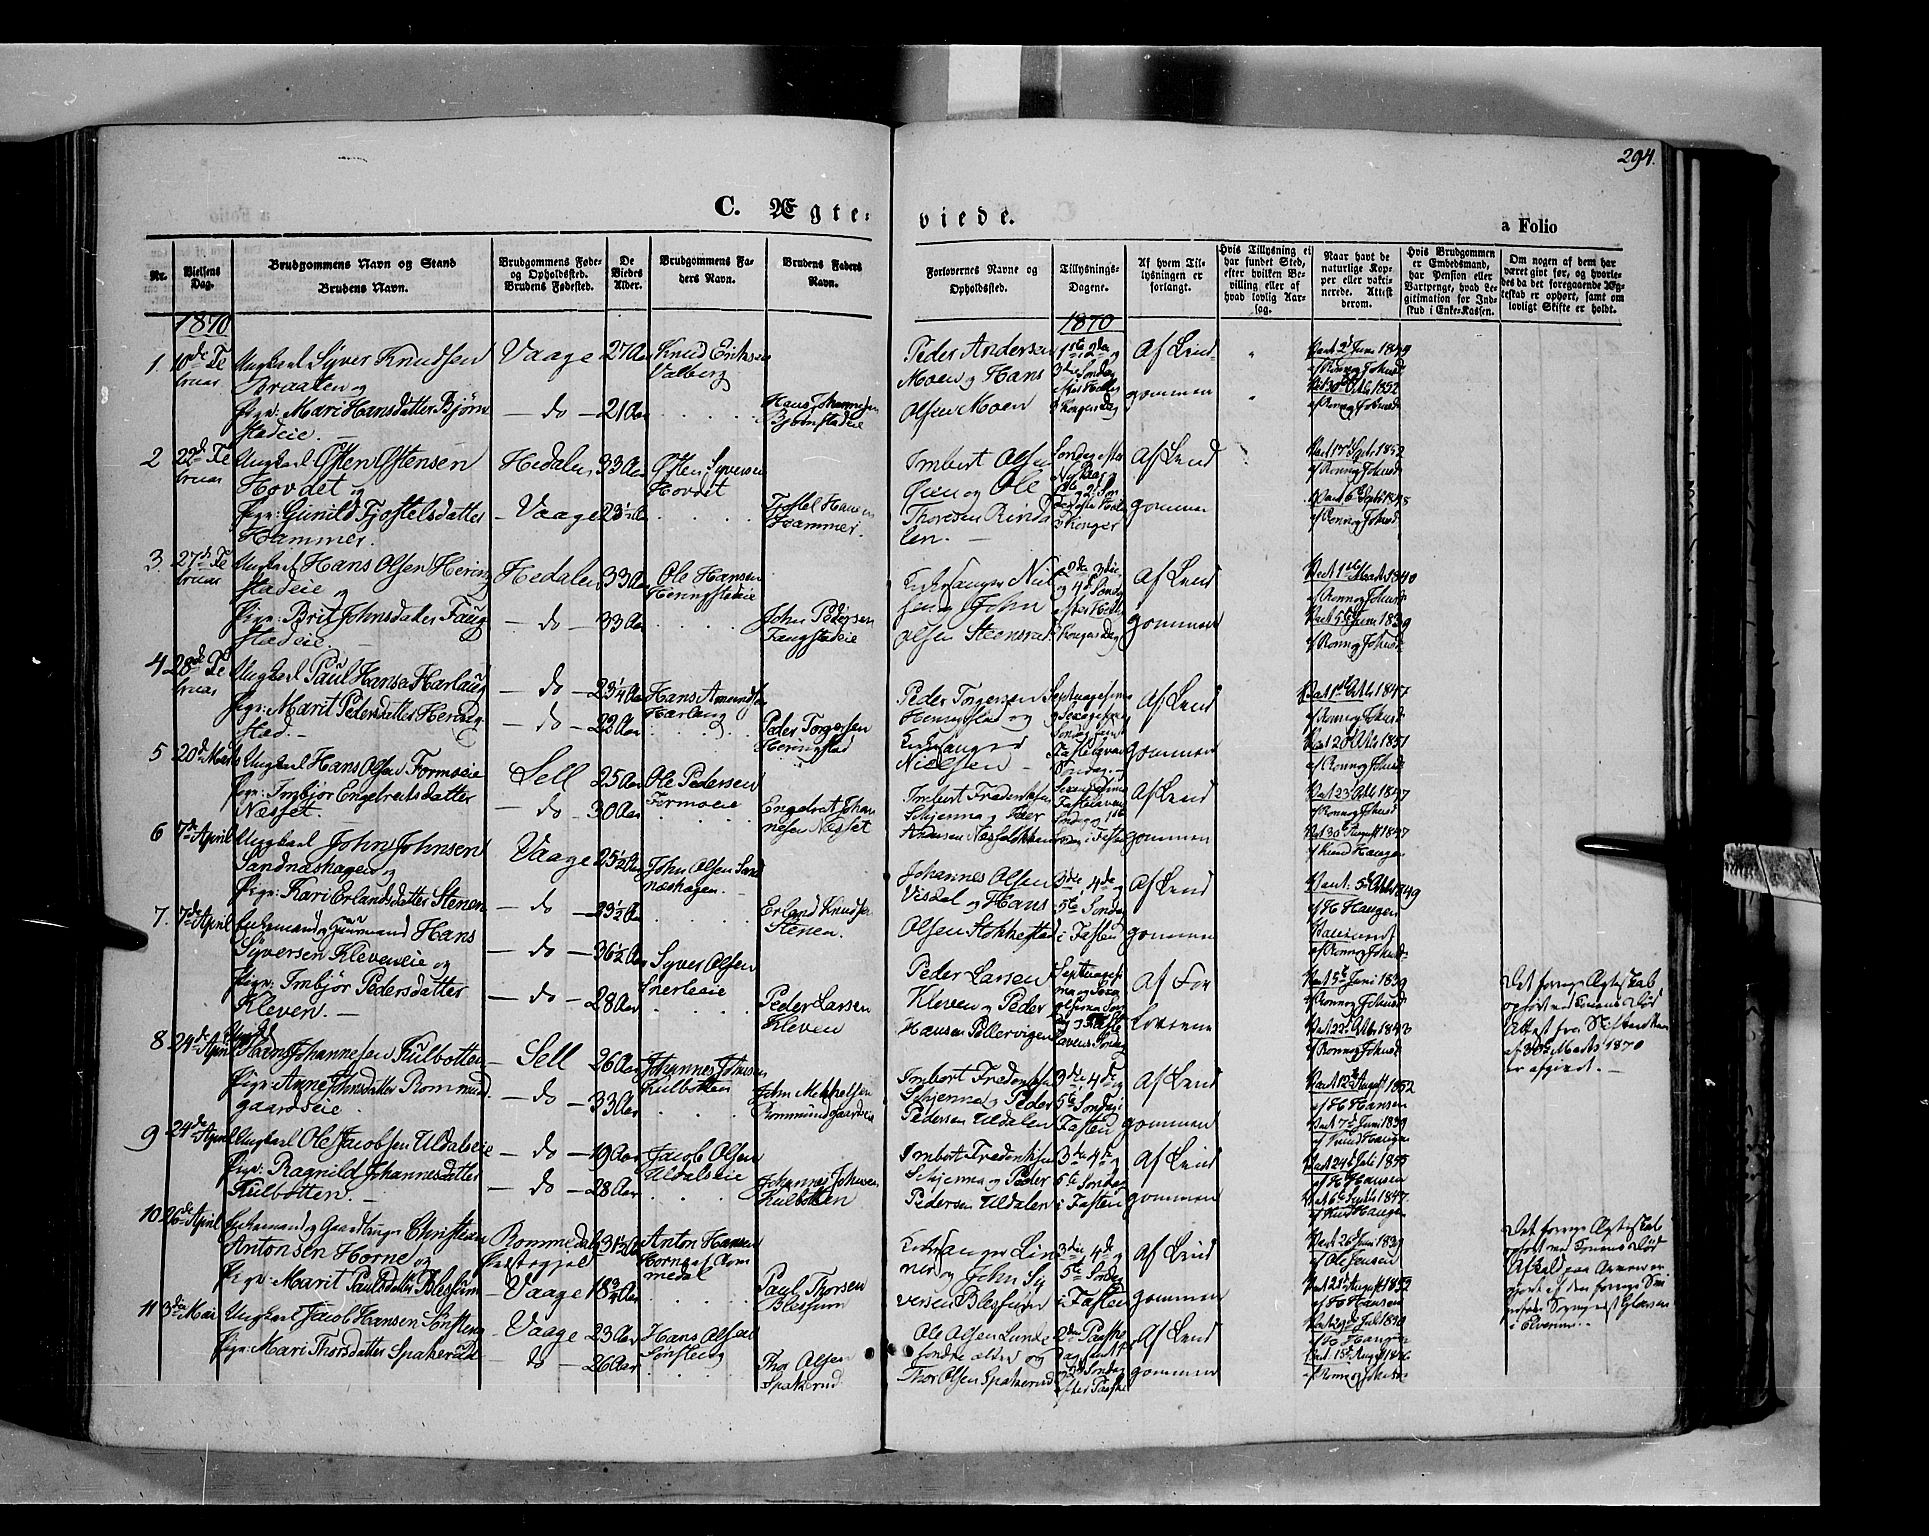 SAH, Vågå prestekontor, Ministerialbok nr. 6 /1, 1856-1872, s. 294